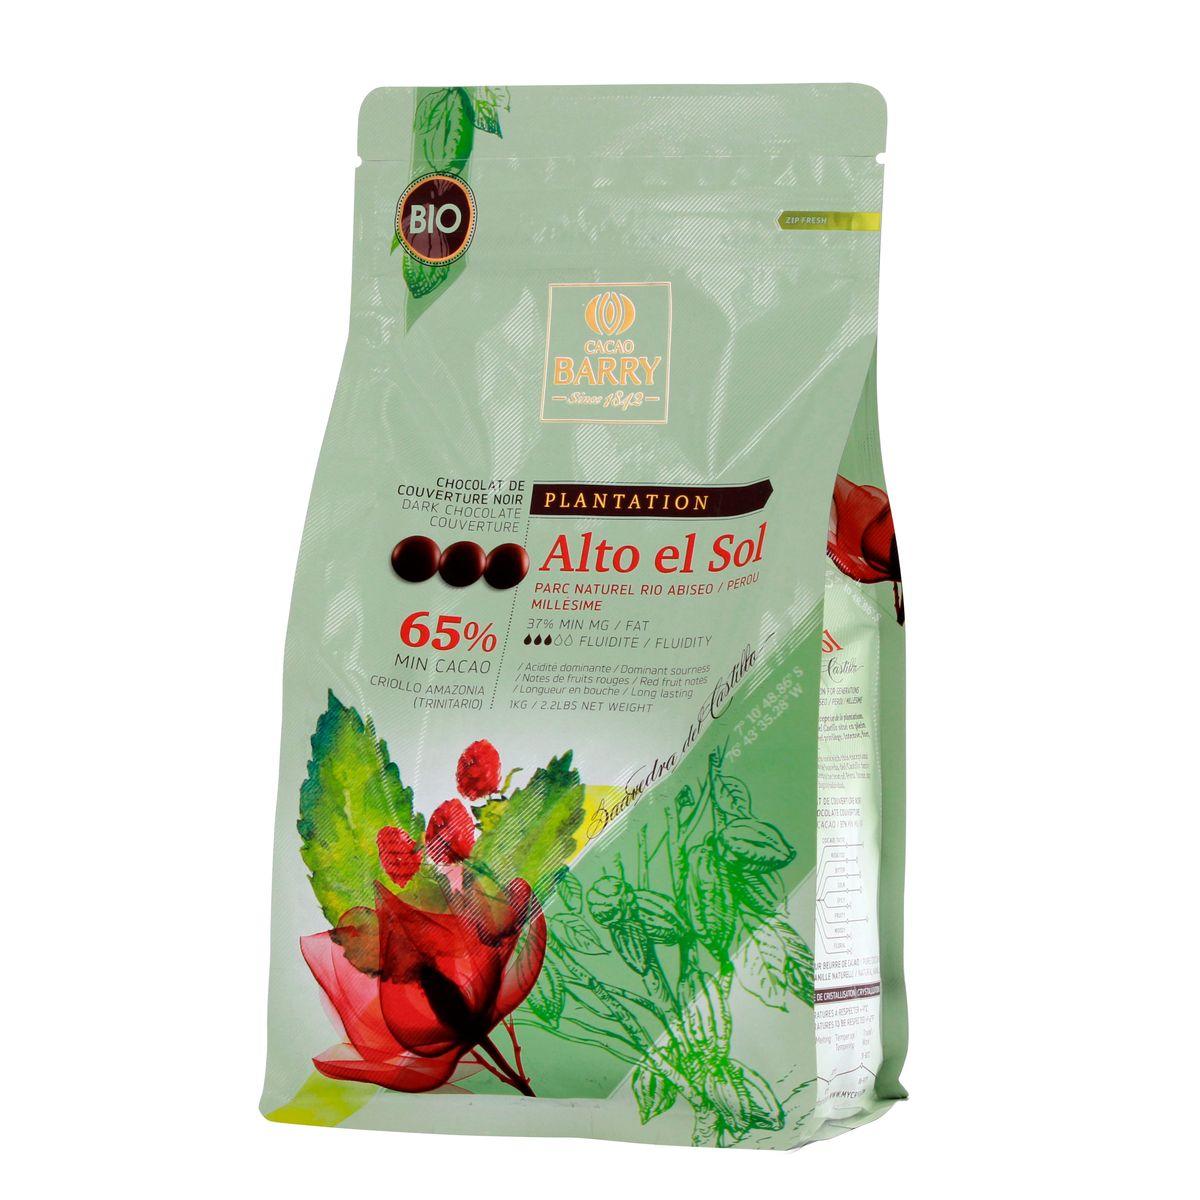 Chocolat de couverture noir Alto El Sol bio 1kg - Barry